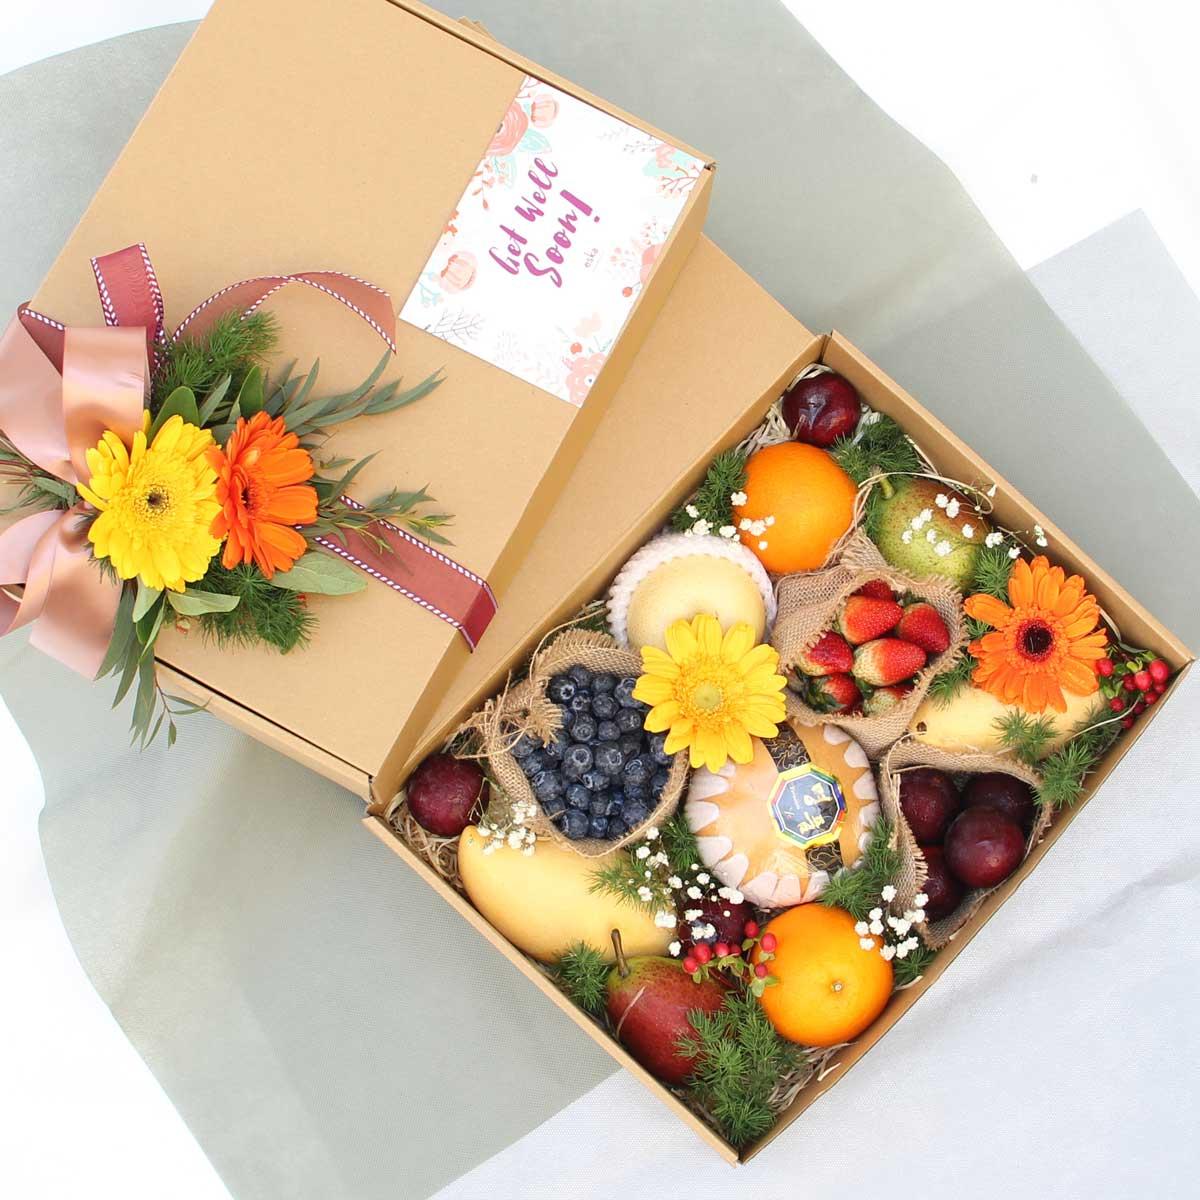 Boxie Fruittie | Fruits Basket | Eska Creative Gifting